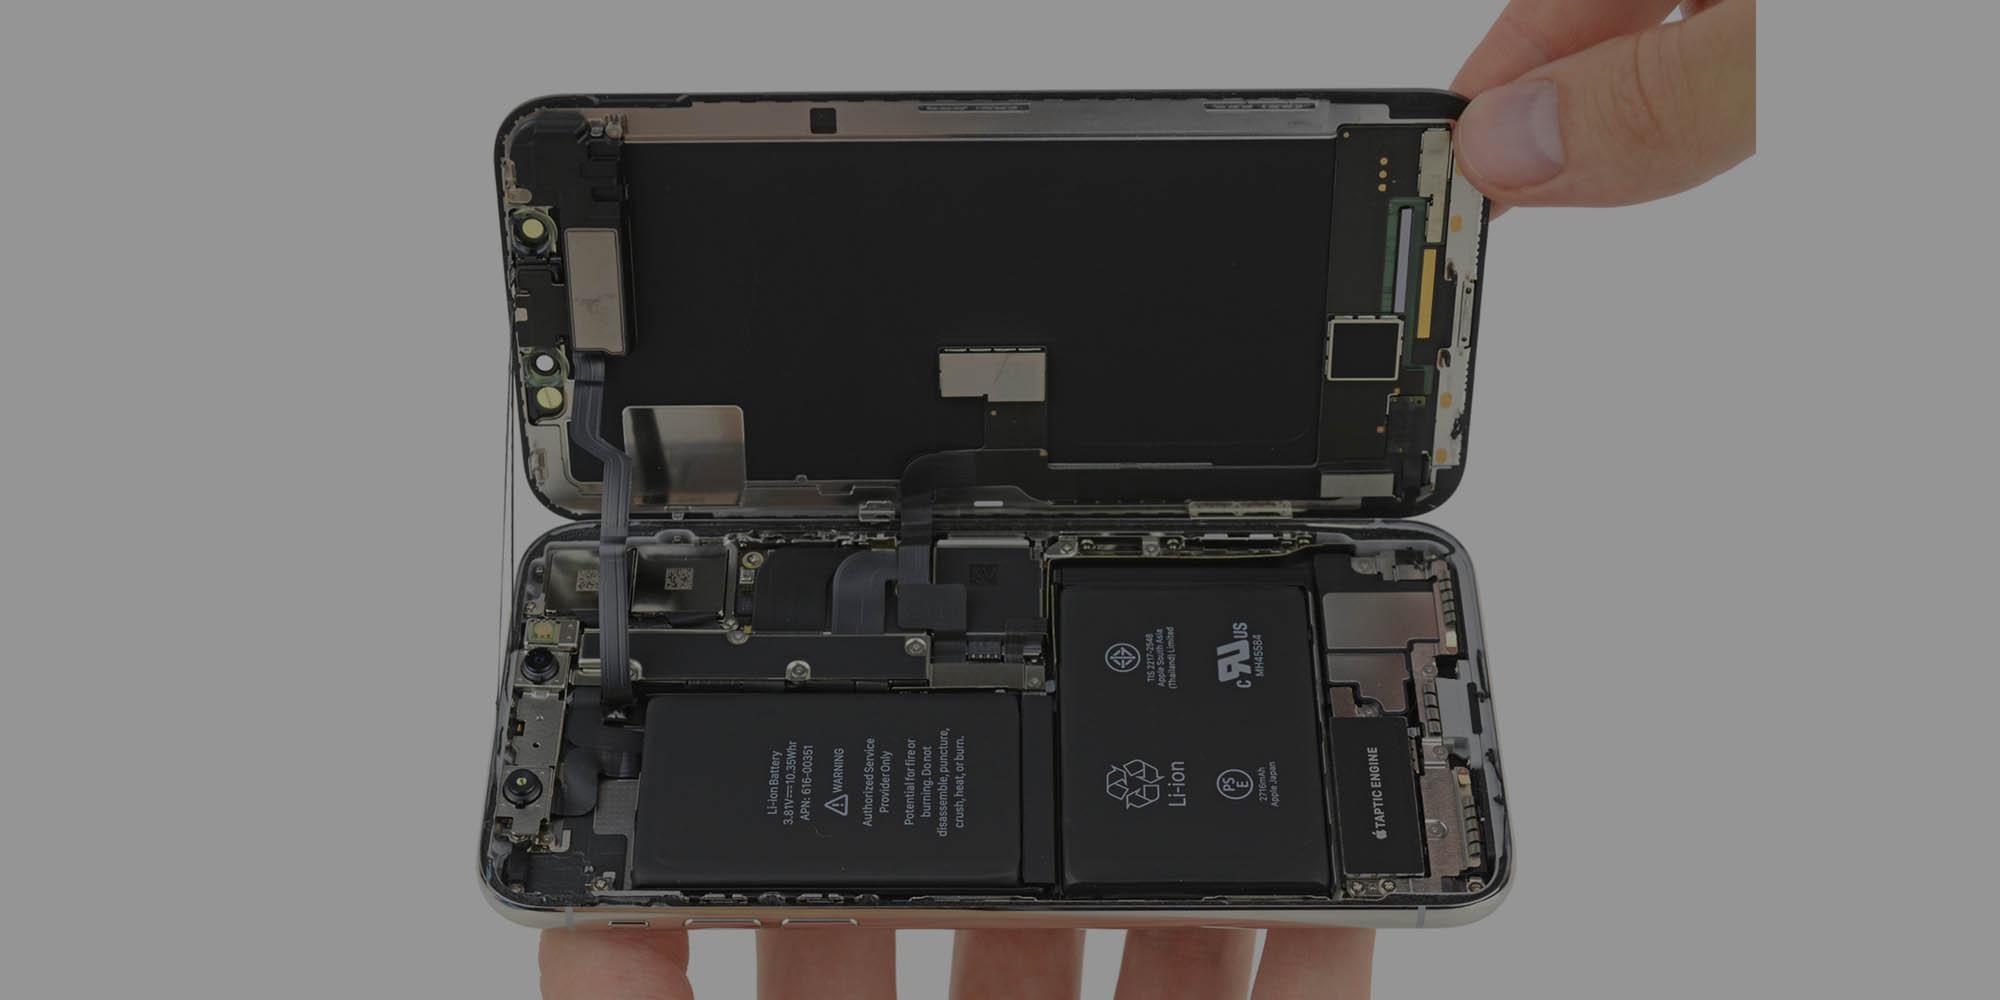 Запчасти для iPhone X, 8 и 8 Plus ужев продаже